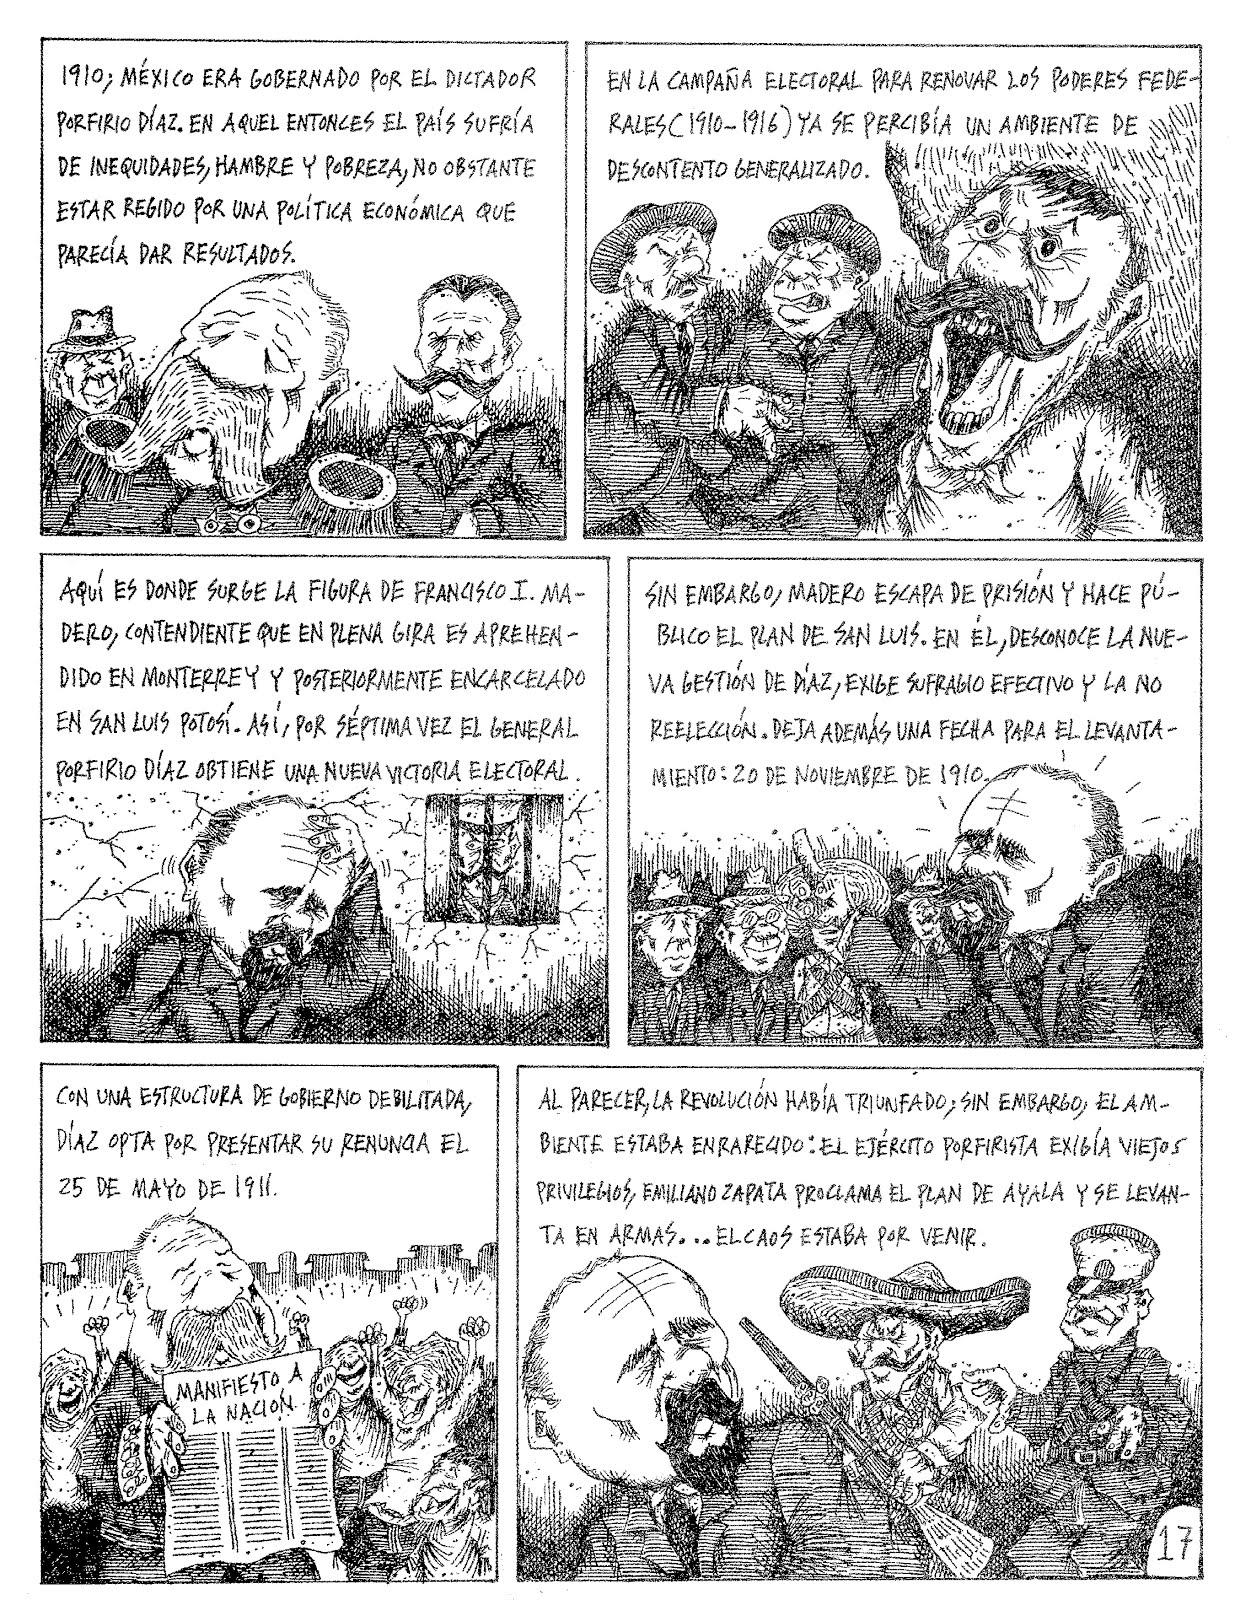 Revolucion Mexicana 2012 la Revolución Mexicana